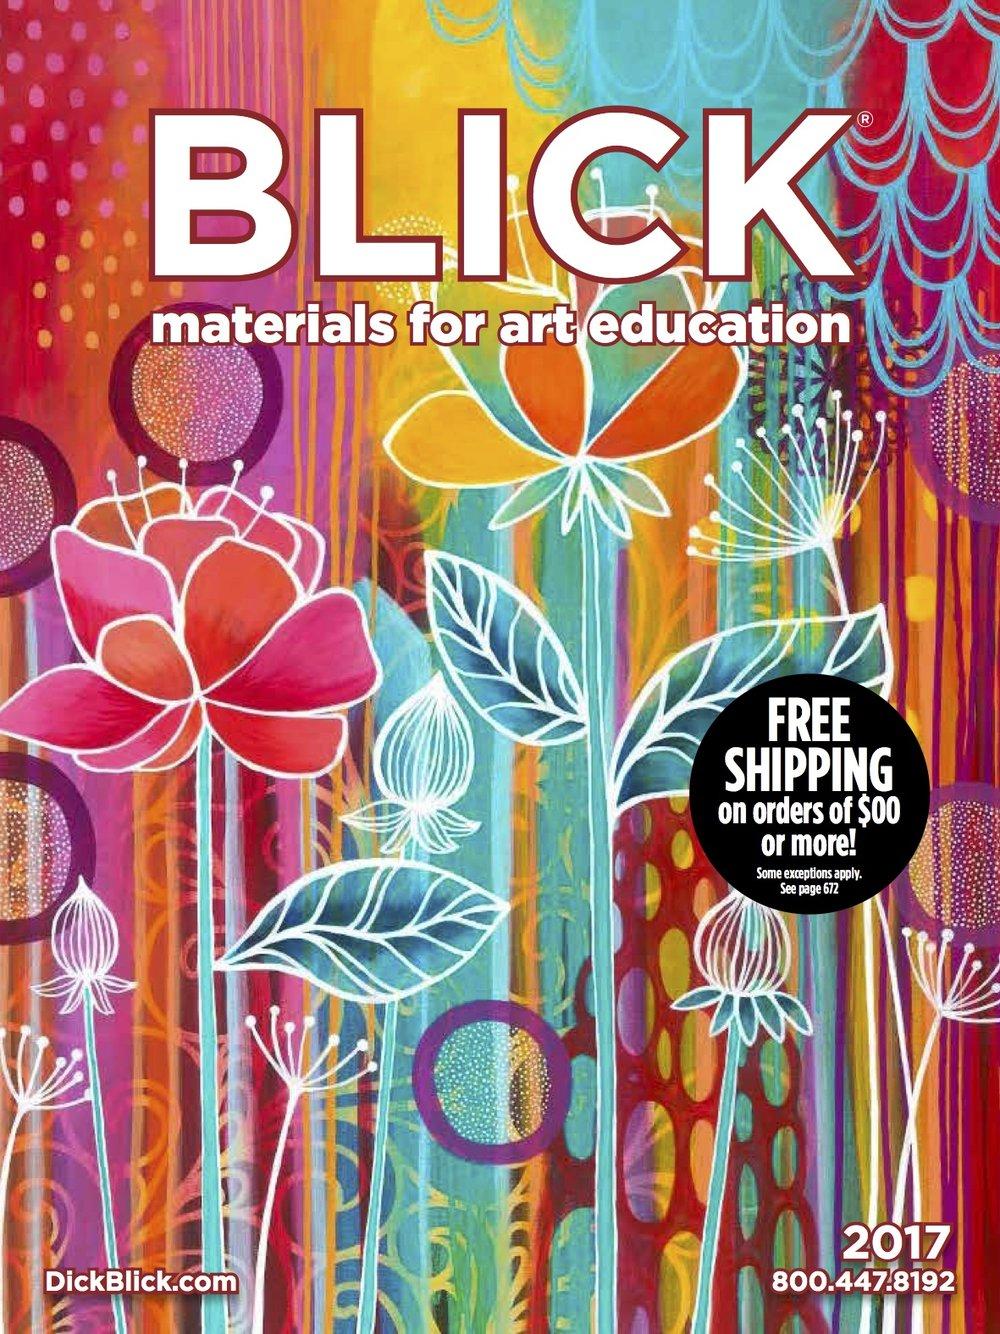 Blick_catalog_raindrops.jpg